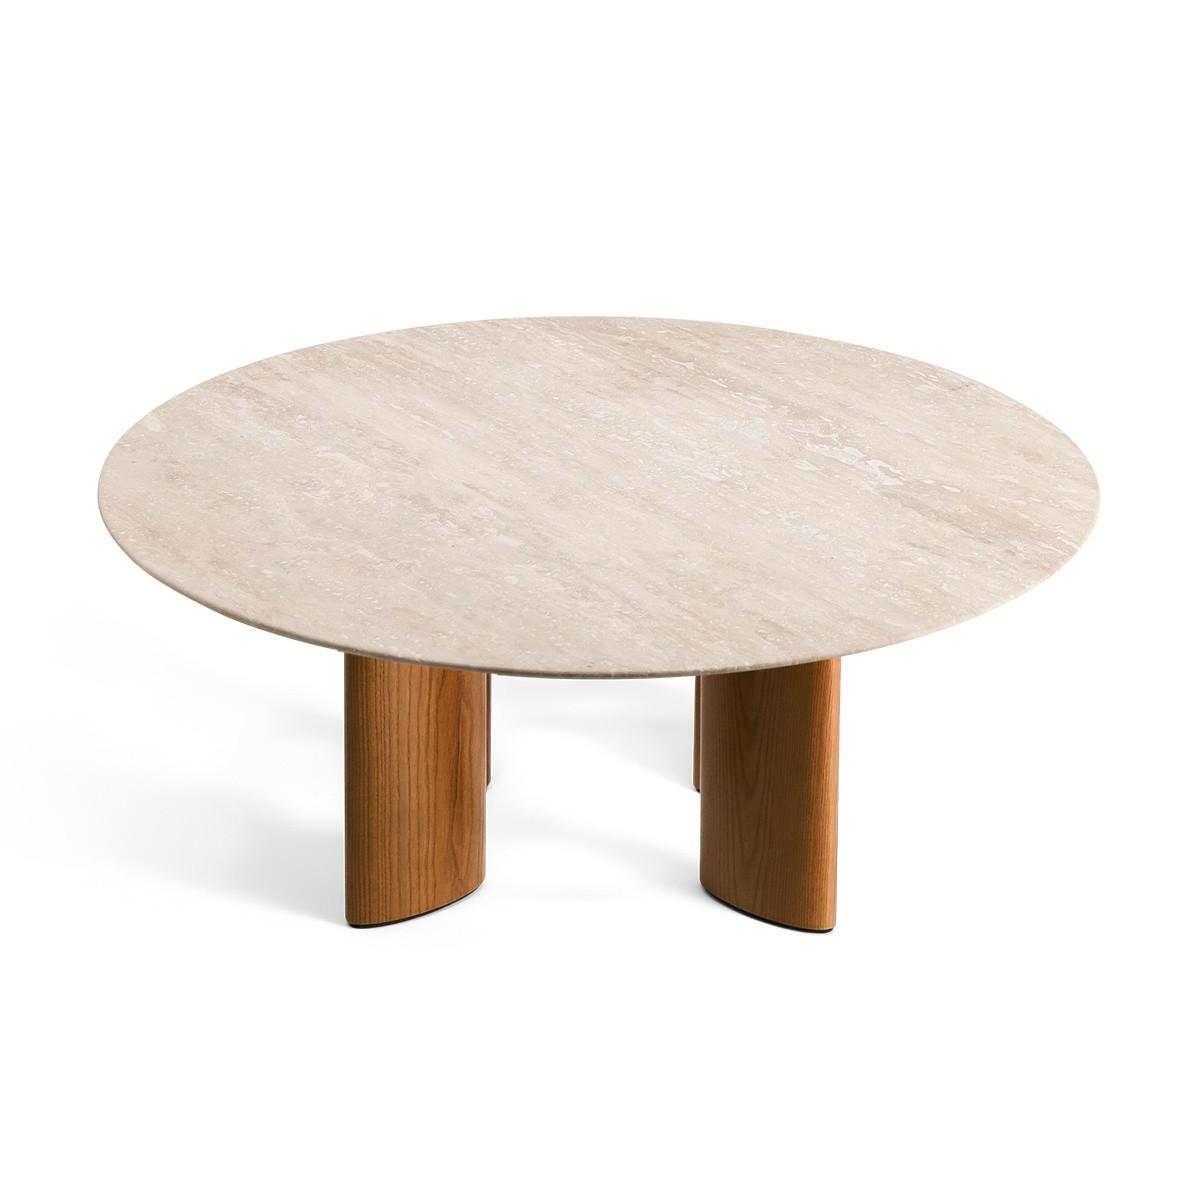 Table basse Carlotta pieds frêne finition iroko et travertin